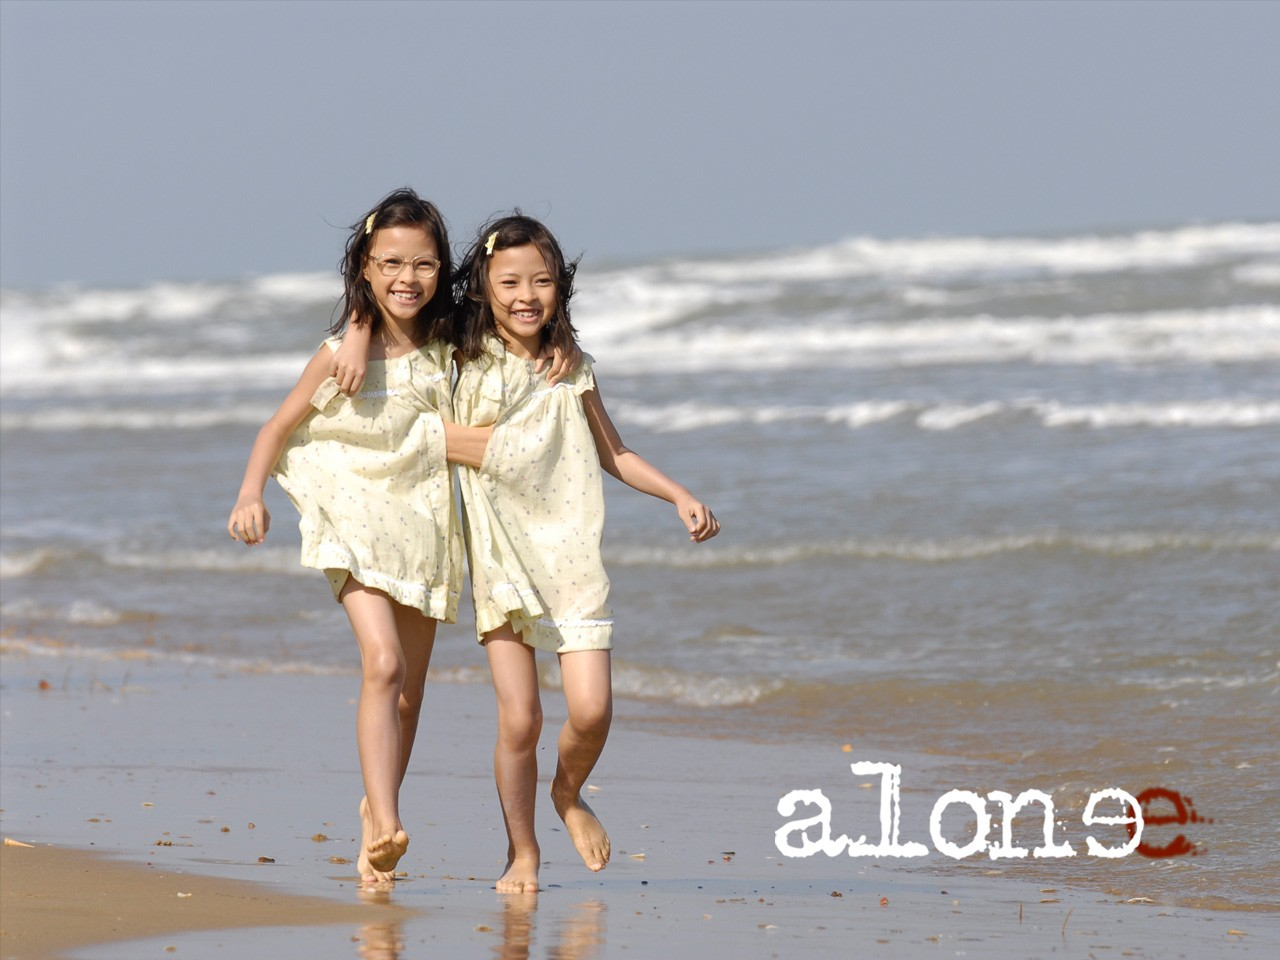 Wallpaper del film thailandese Alone con le due gemelle siamesi protagoniste